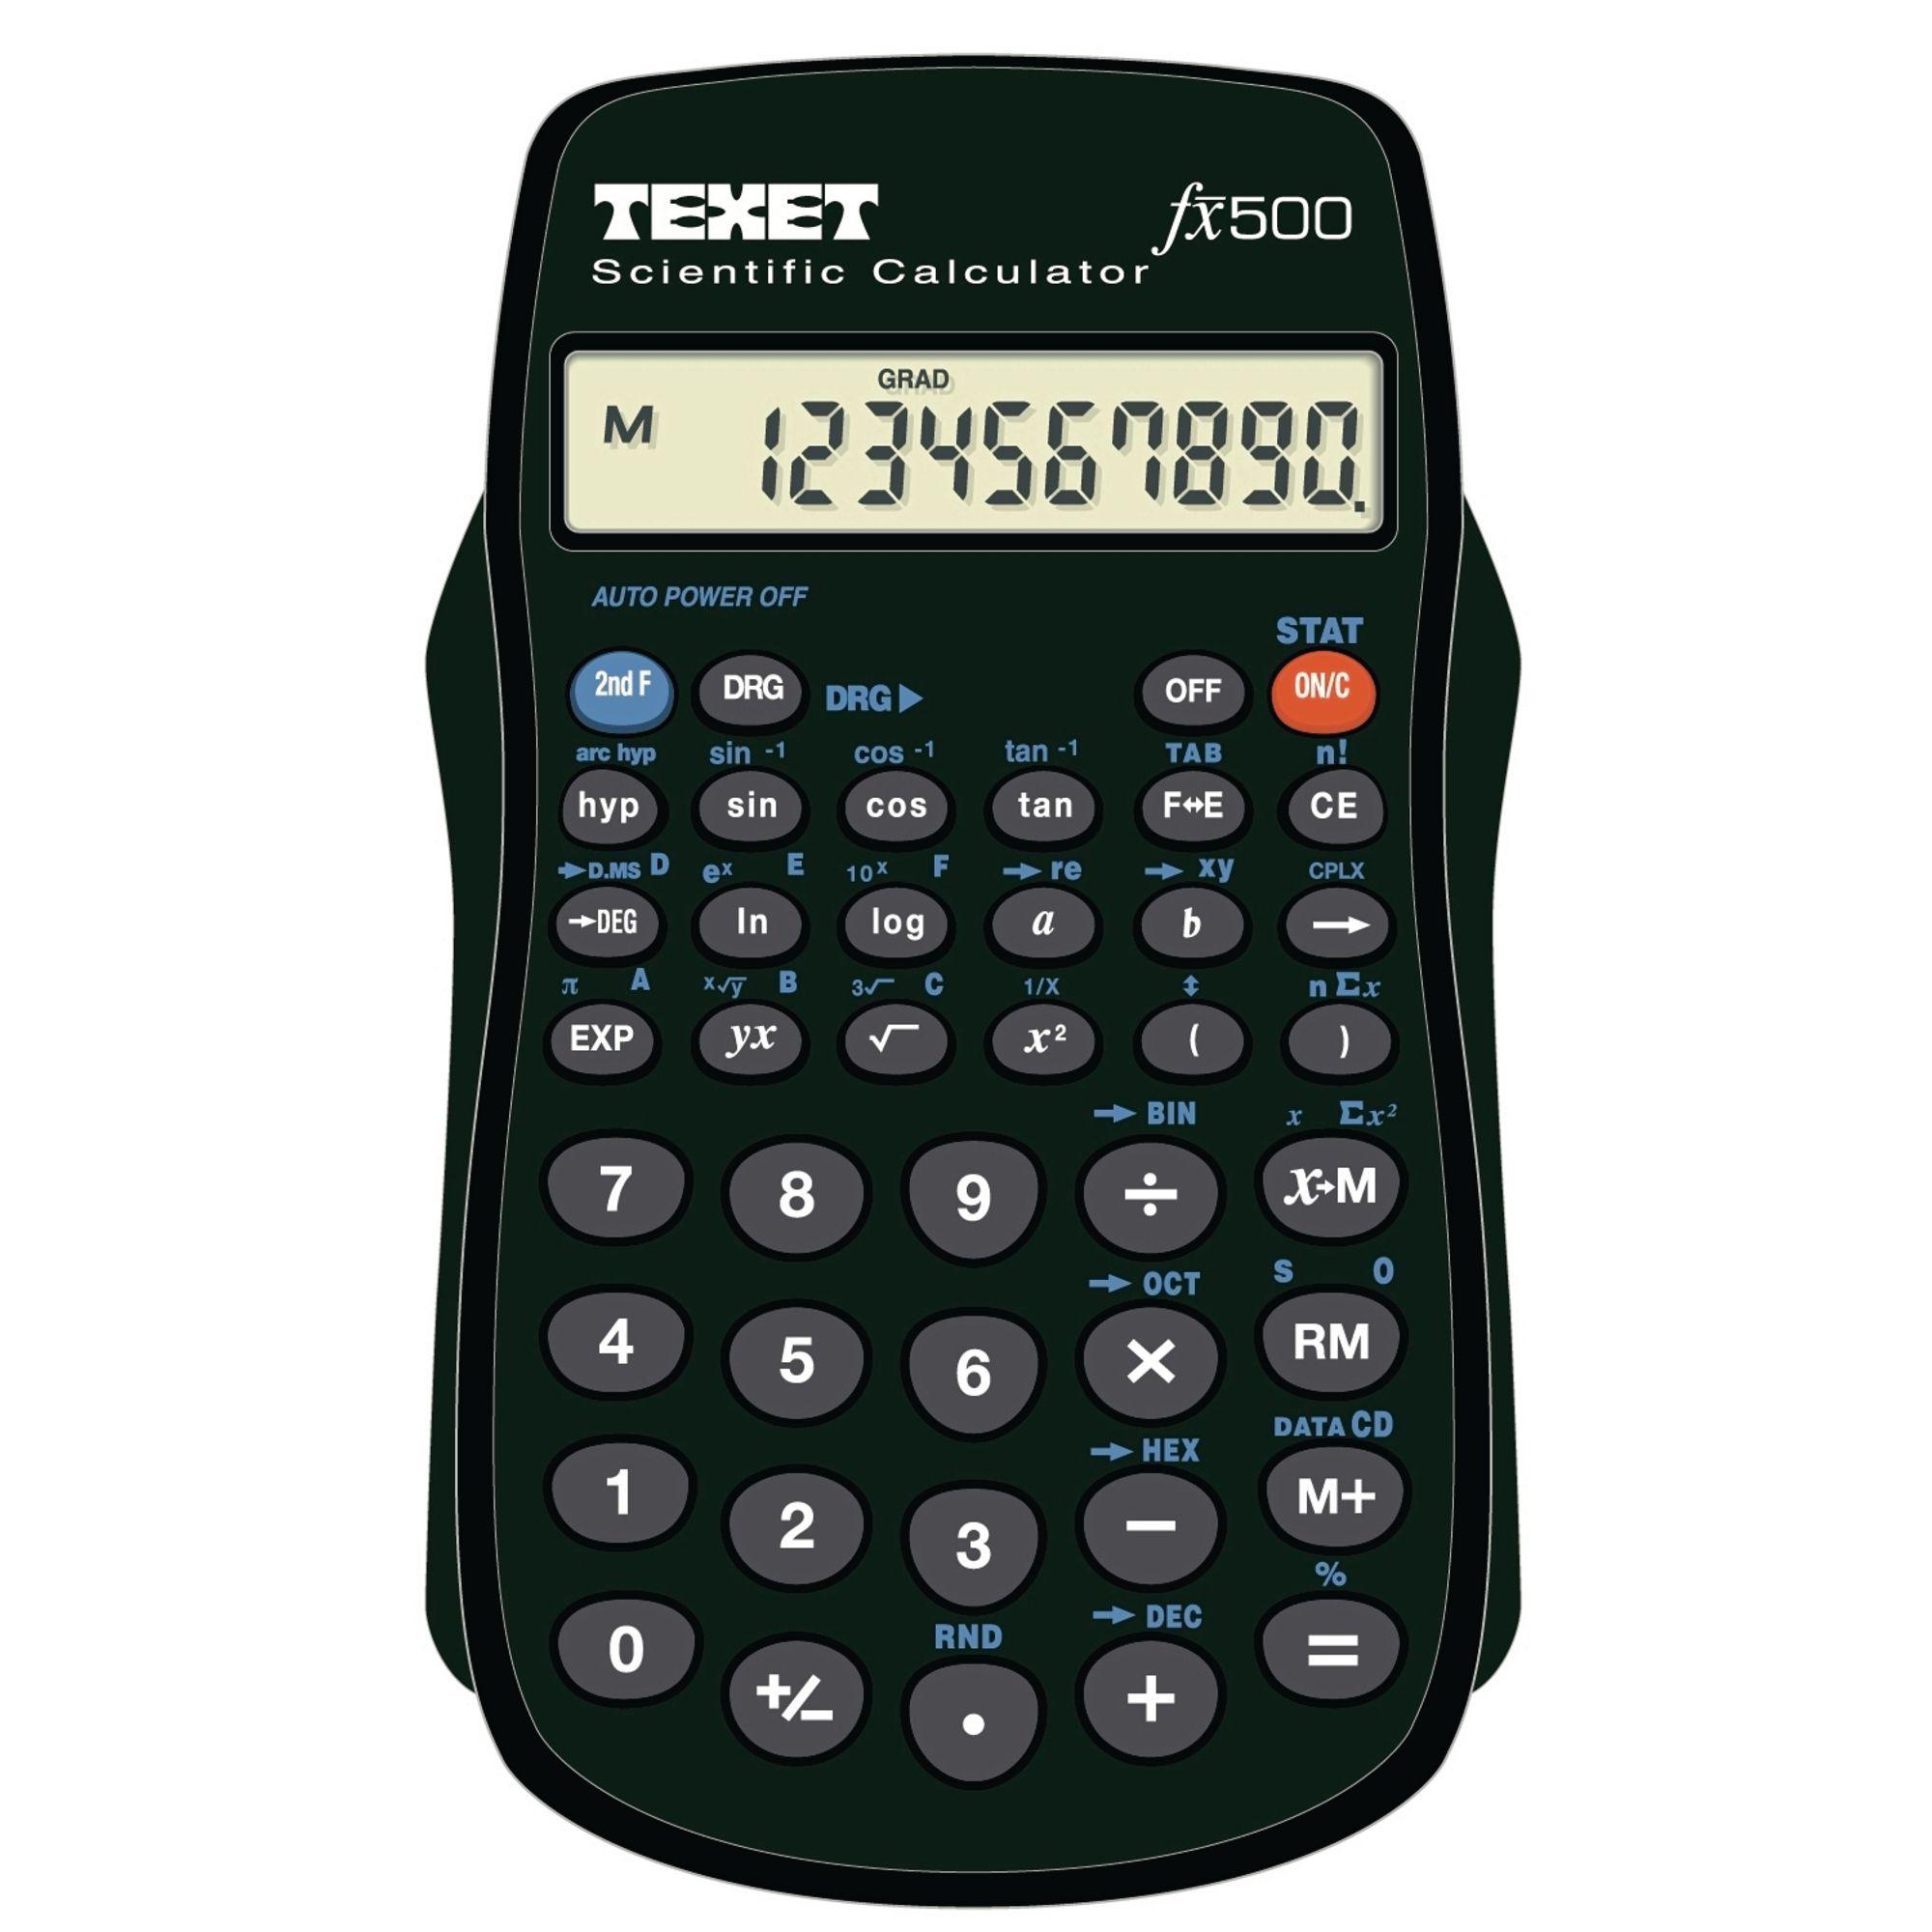 Texet Fx500 Calculator